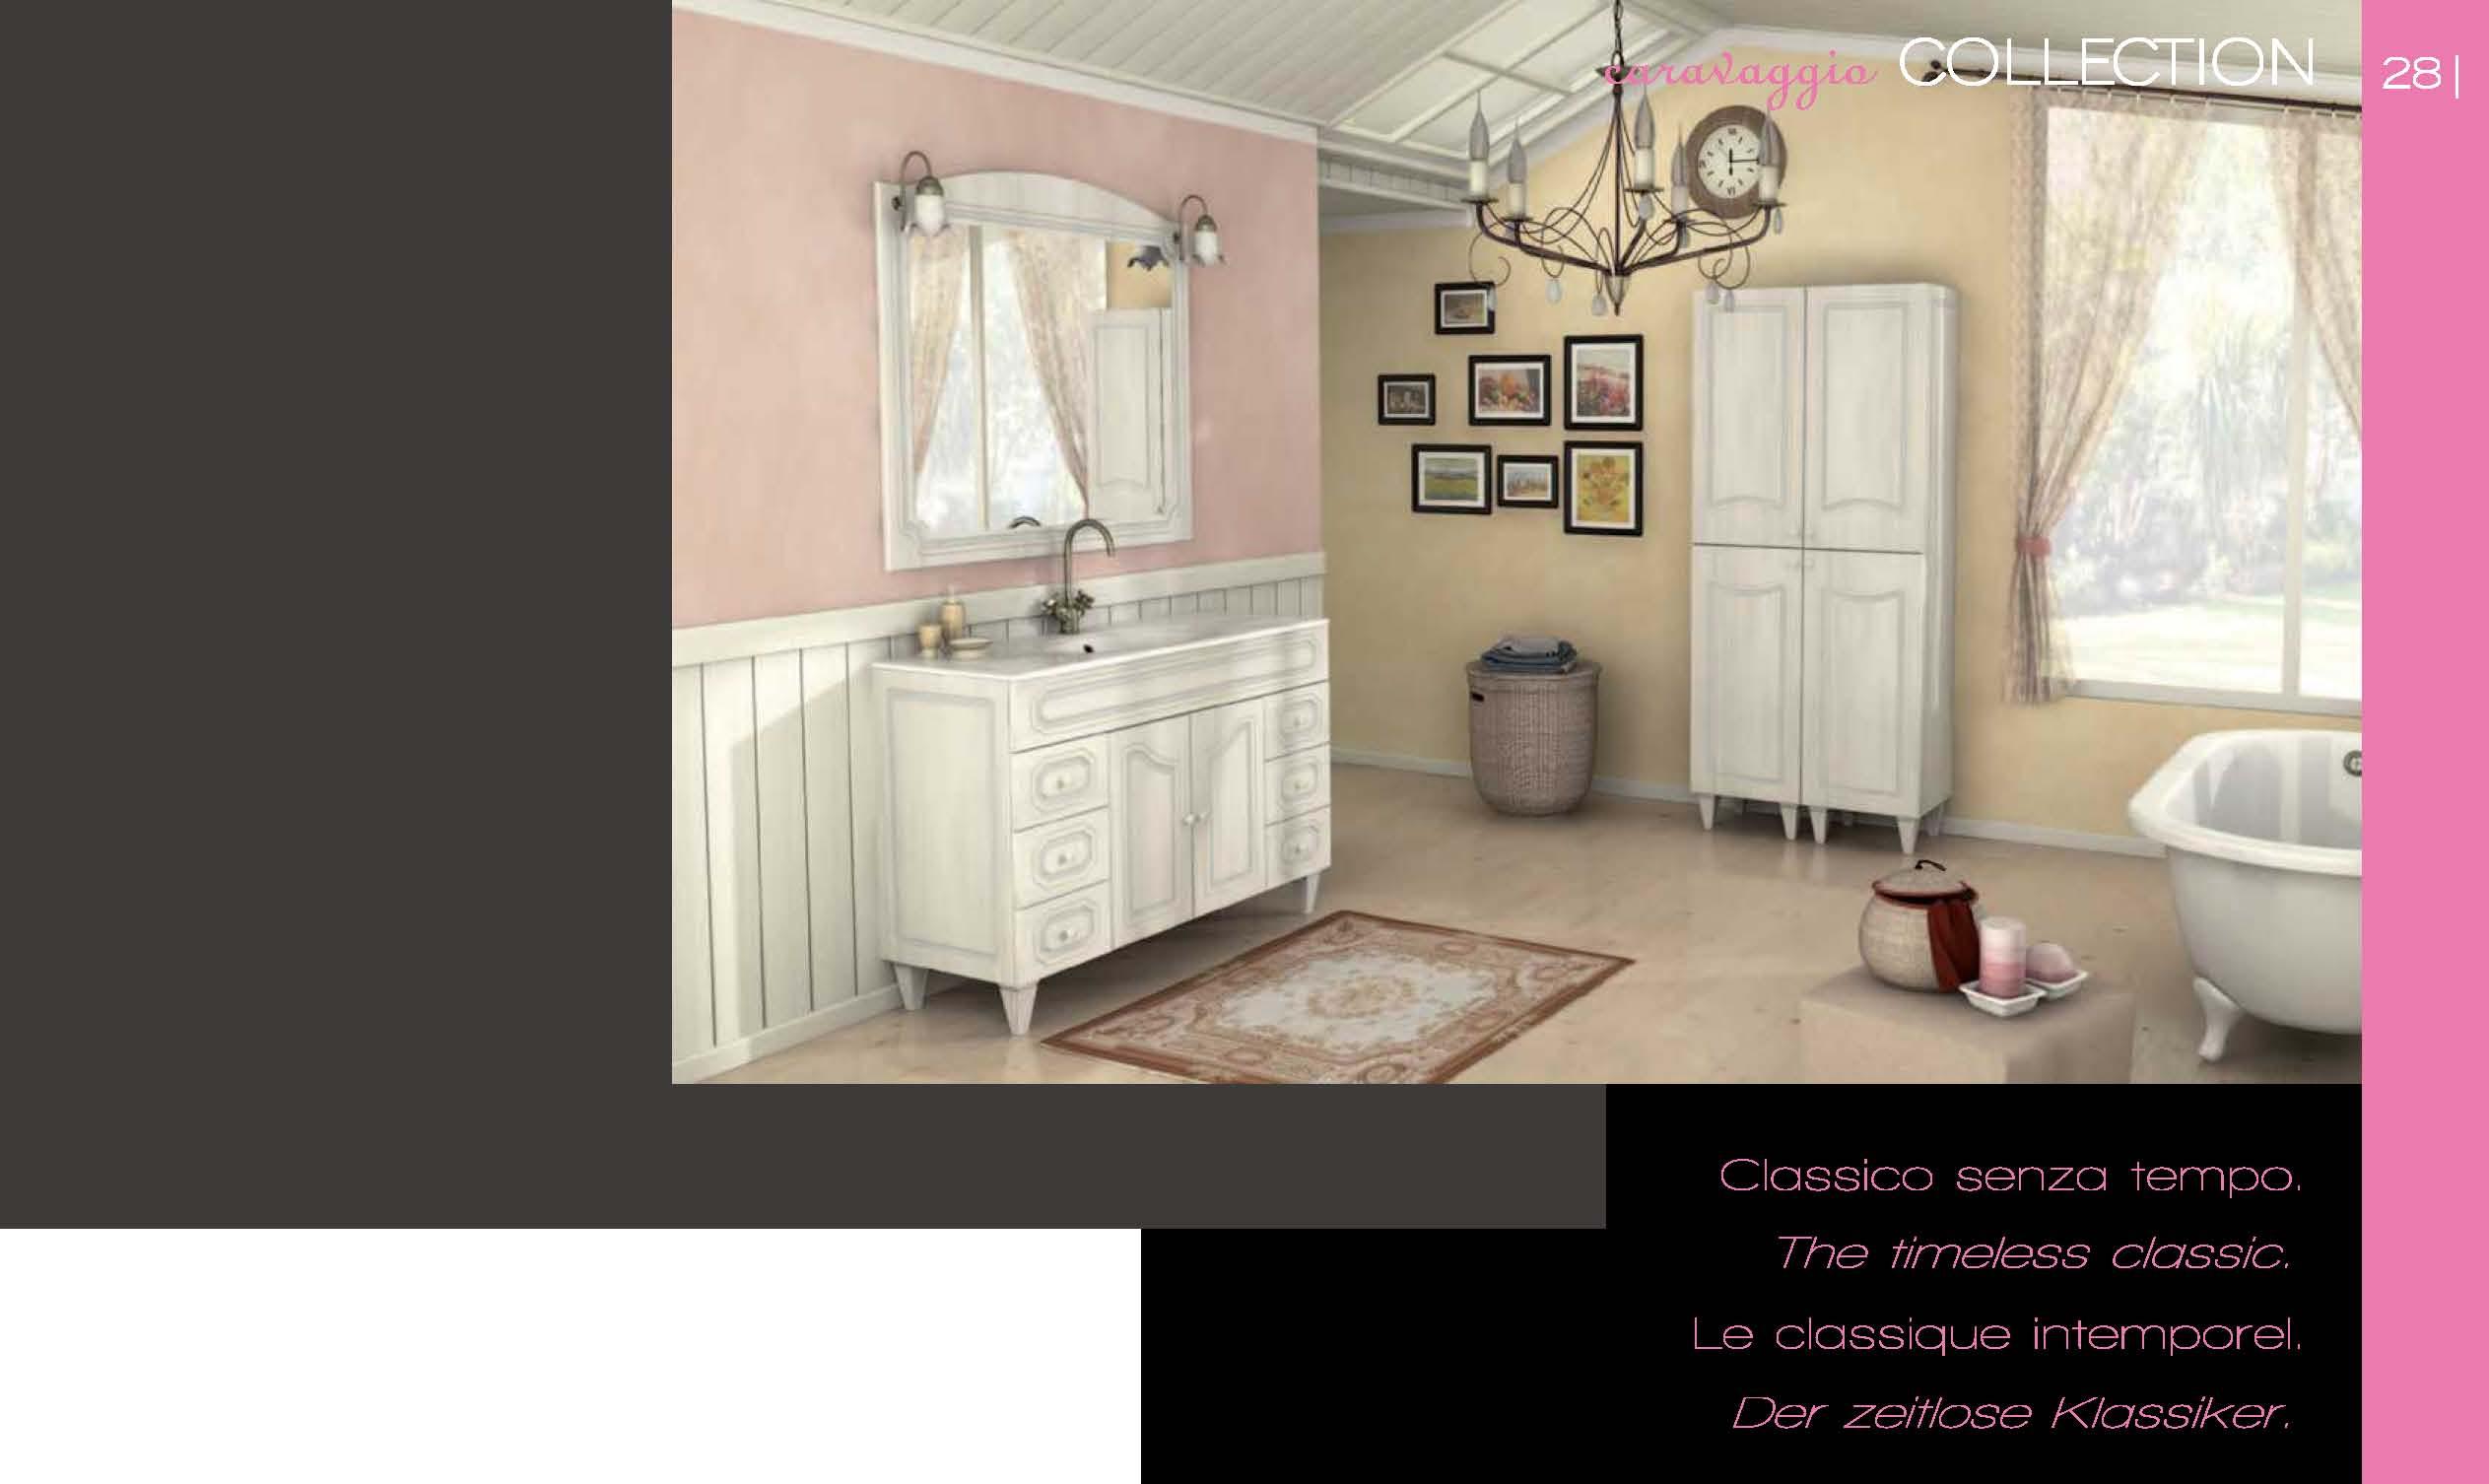 arredo bagno - baden haus - caravaggio - Arredo Bagno Caravaggio